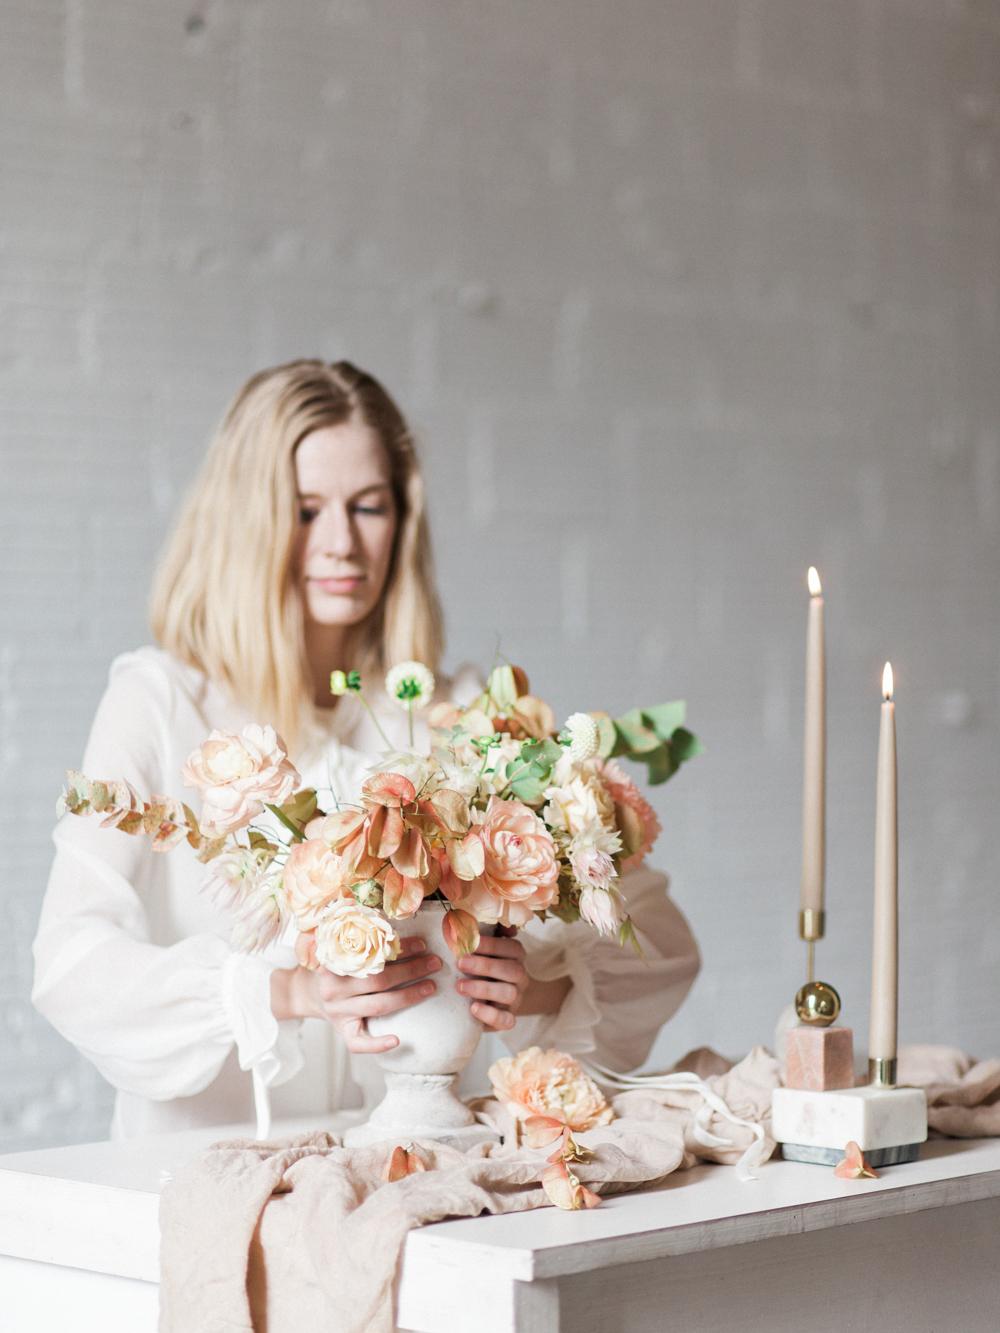 Christine Gosch - The Petaler - Houston fine art photographer - houston wedding florist-3.jpg